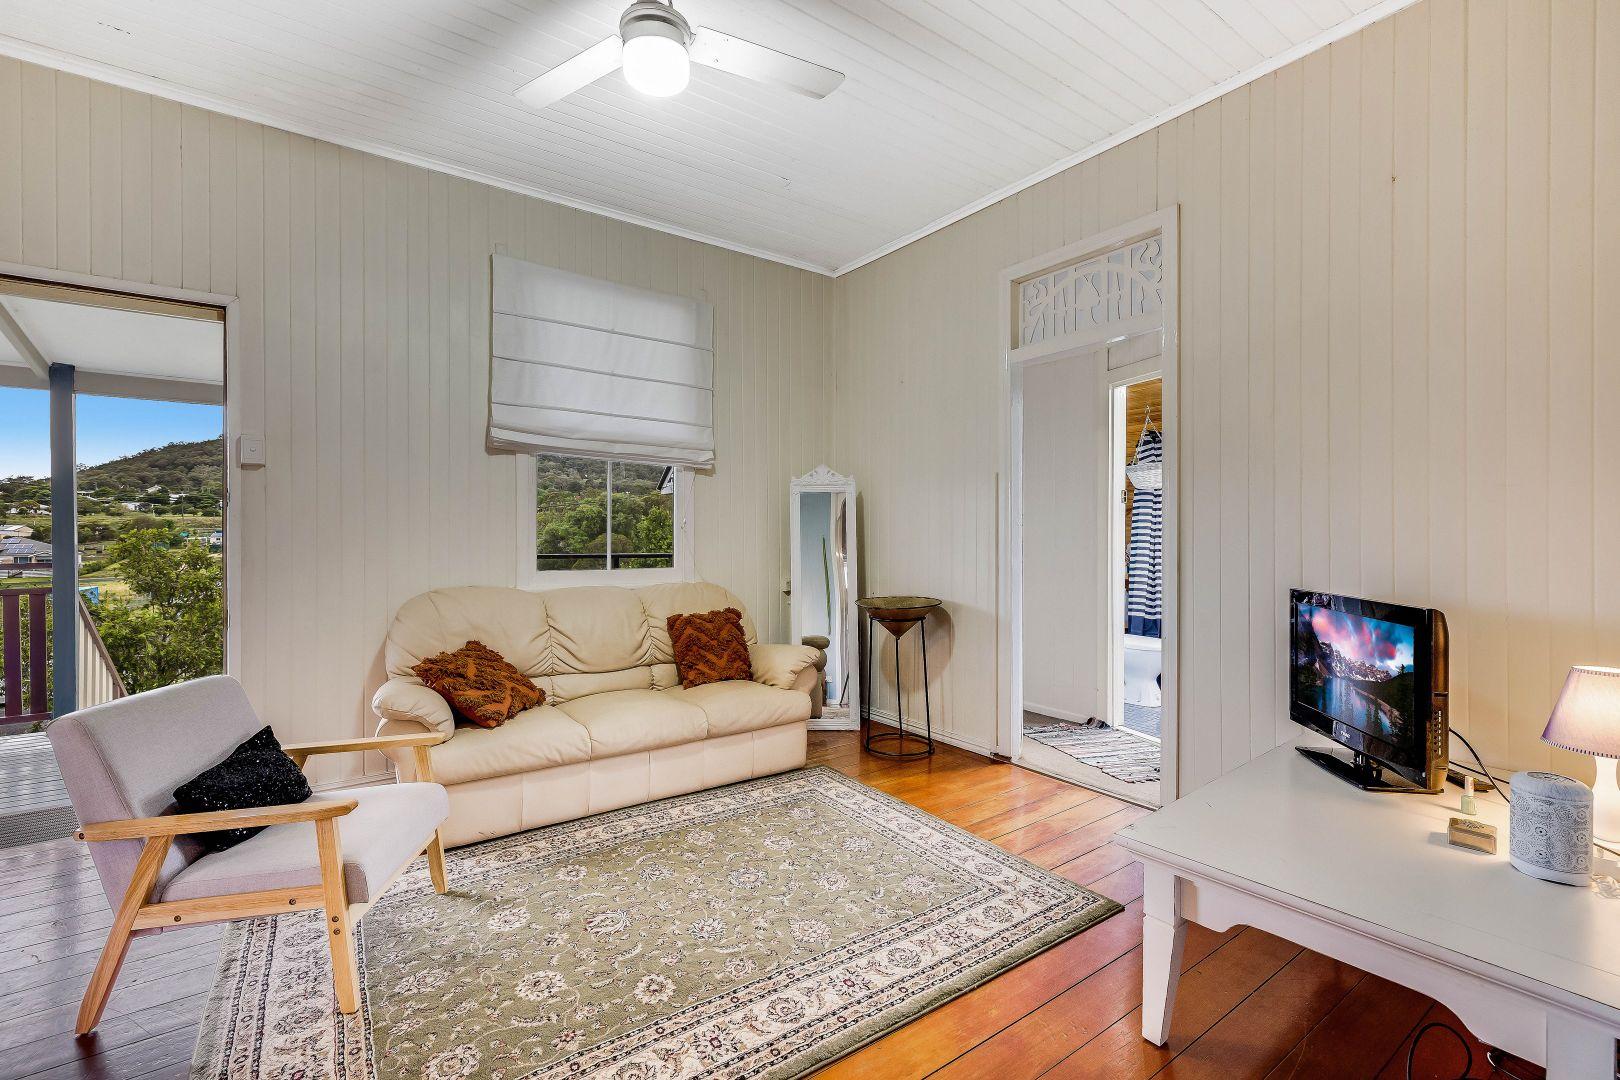 14 Elton Street, Greenmount QLD 4359, Image 2